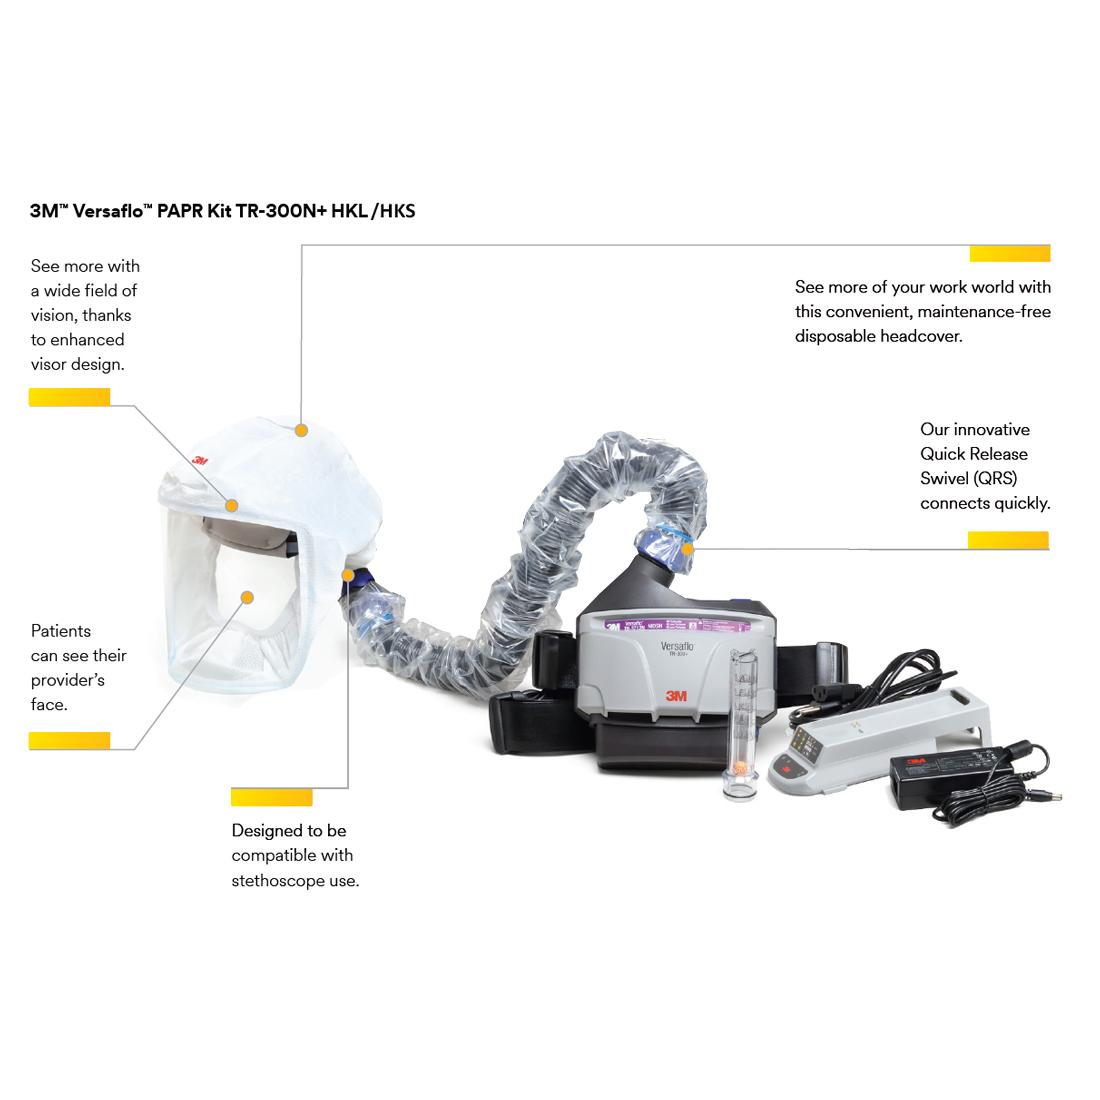 3M Versaflo TR-300N+ PAPR Kit details image